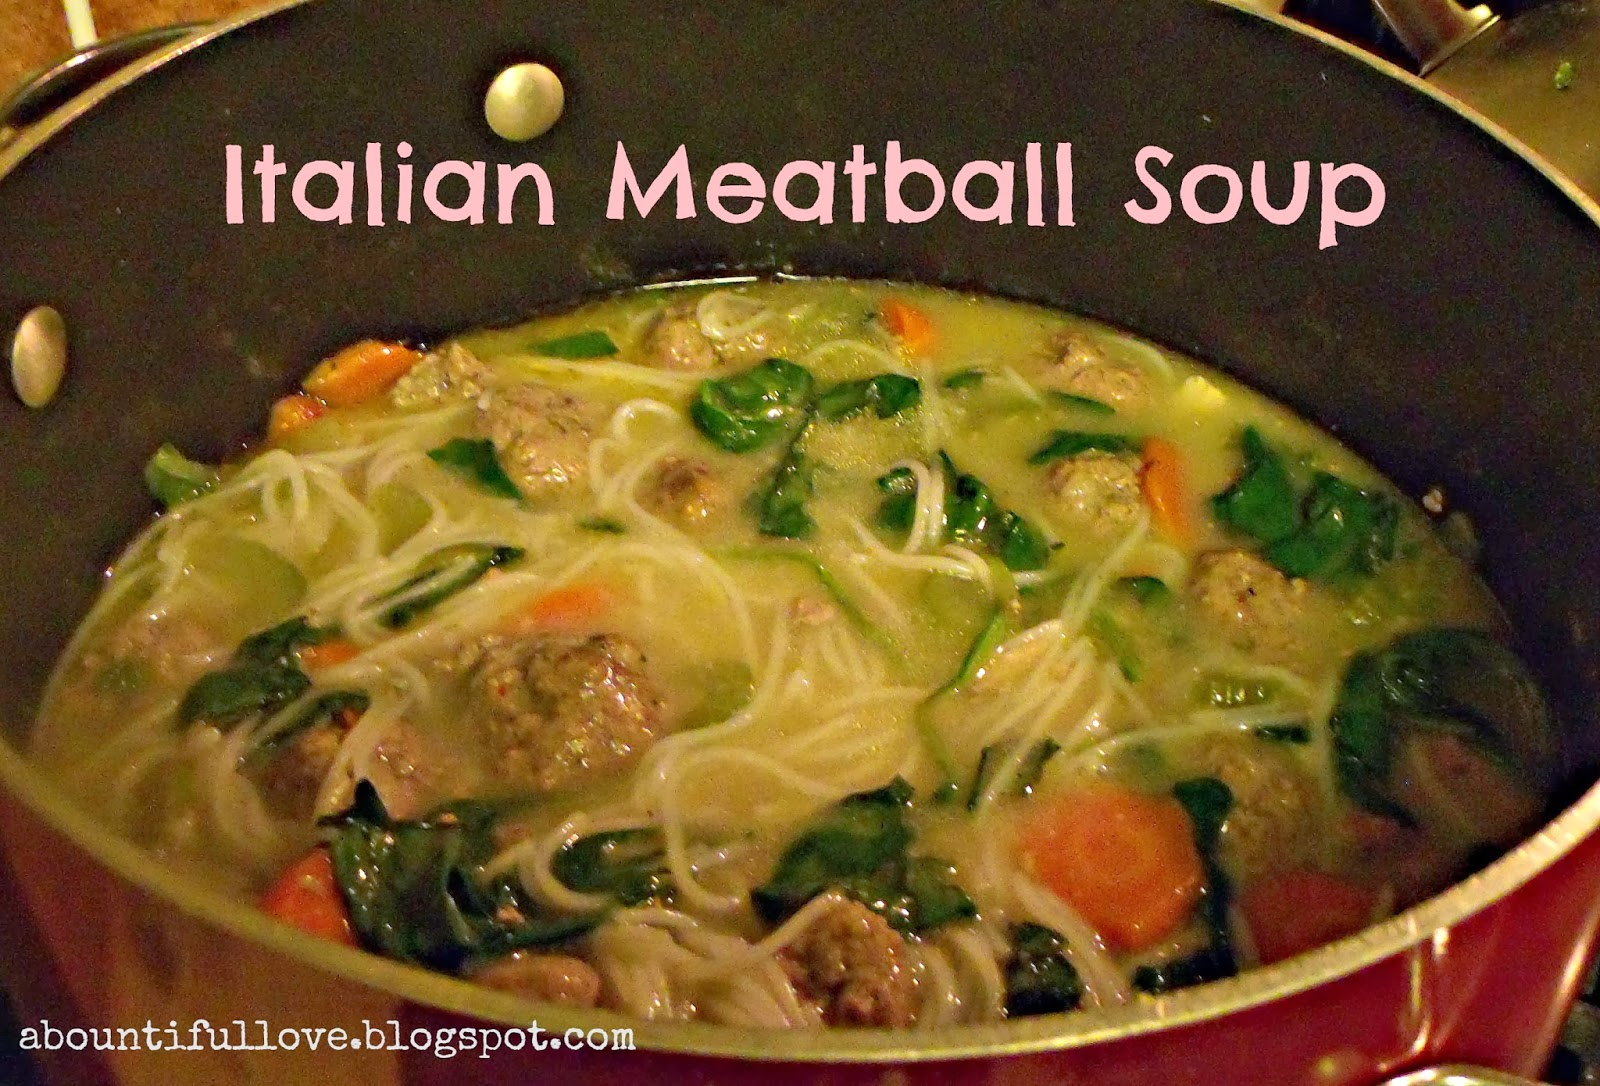 A Bountiful Love: Italian Meatball Soup